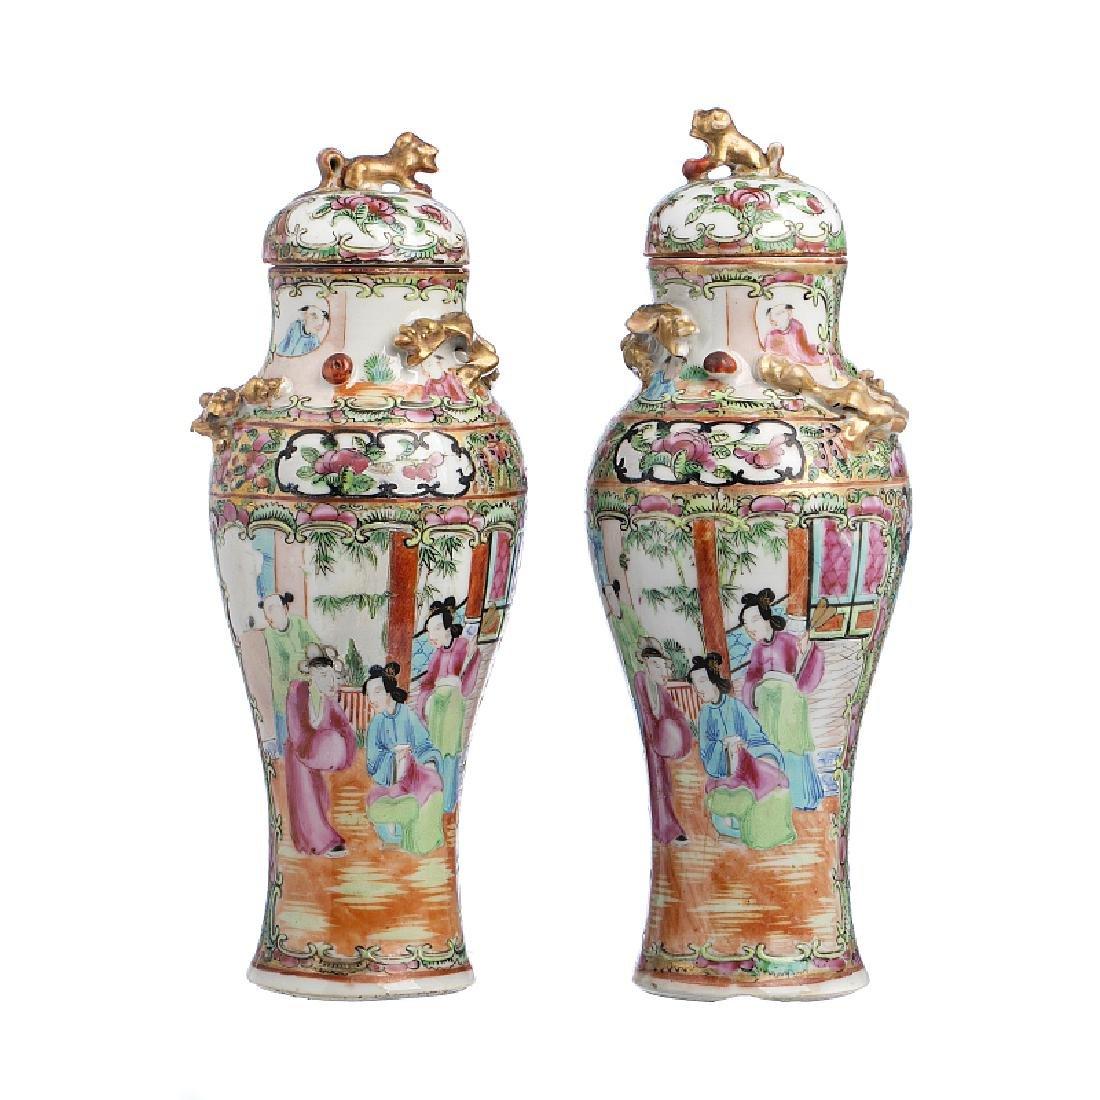 Chinese Porcelain 'mandarim' pair of pots with lid